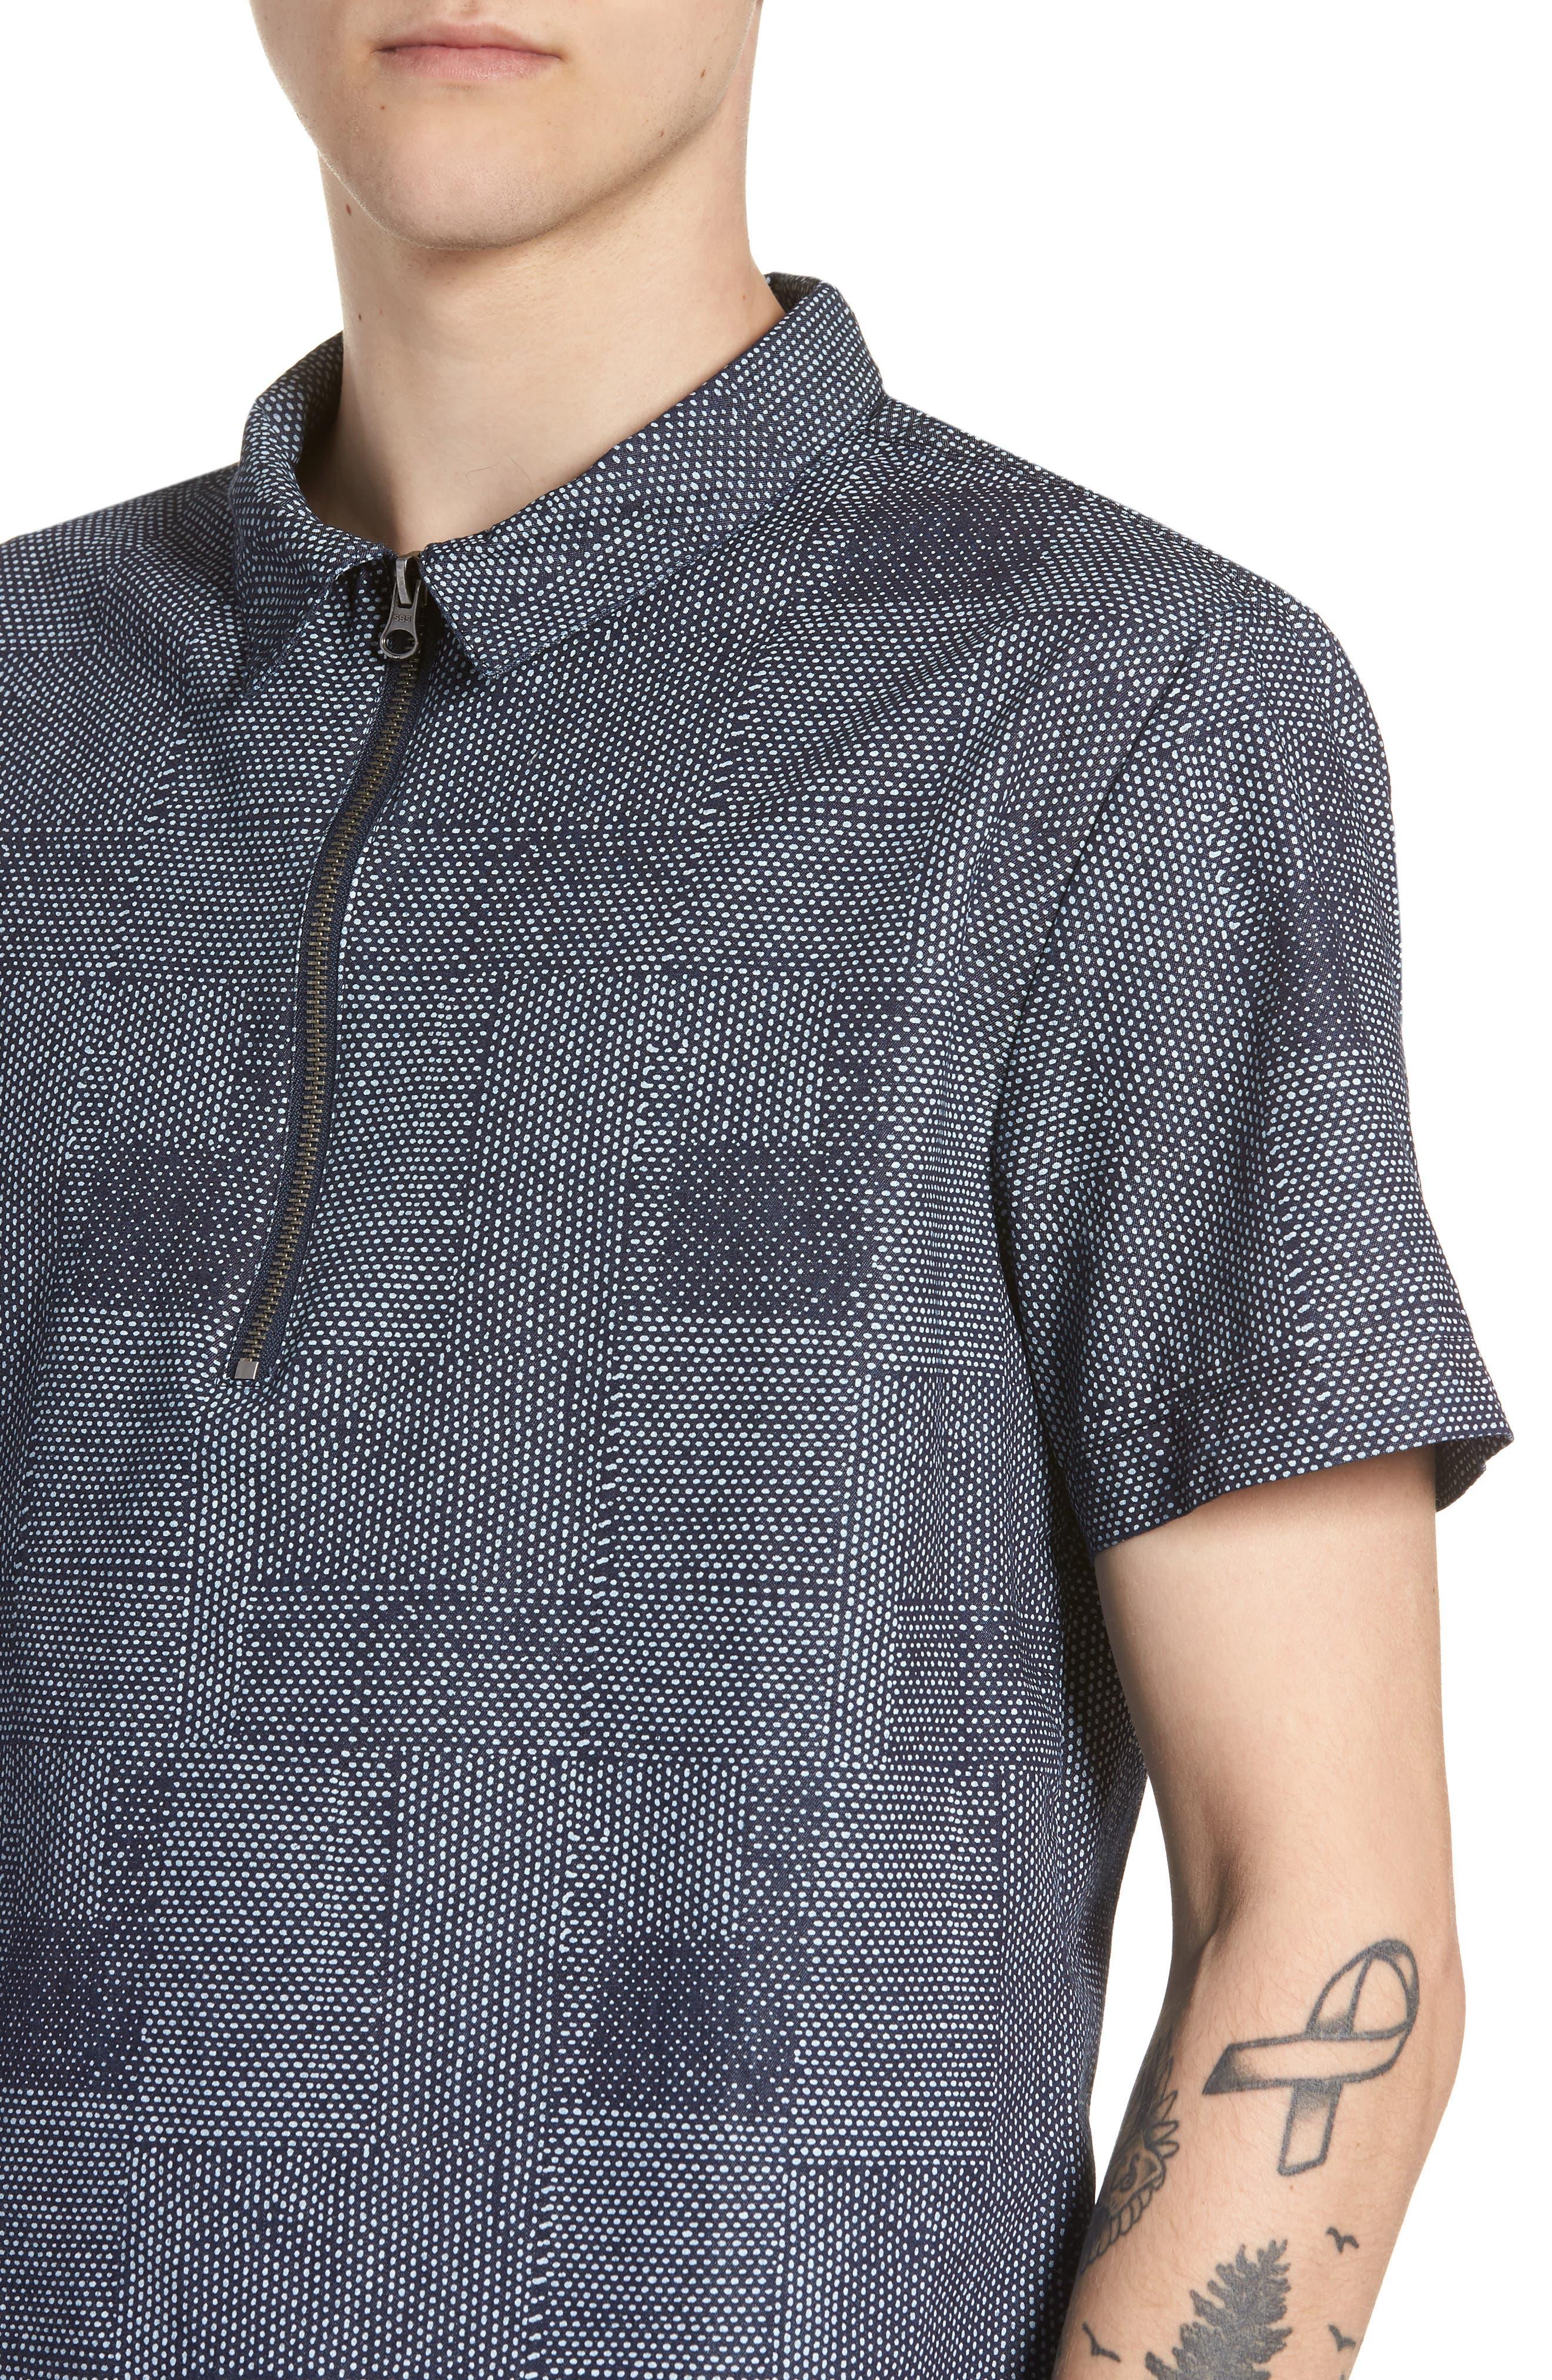 Dotpatch Woven Shirt,                             Alternate thumbnail 4, color,                             INDIGO